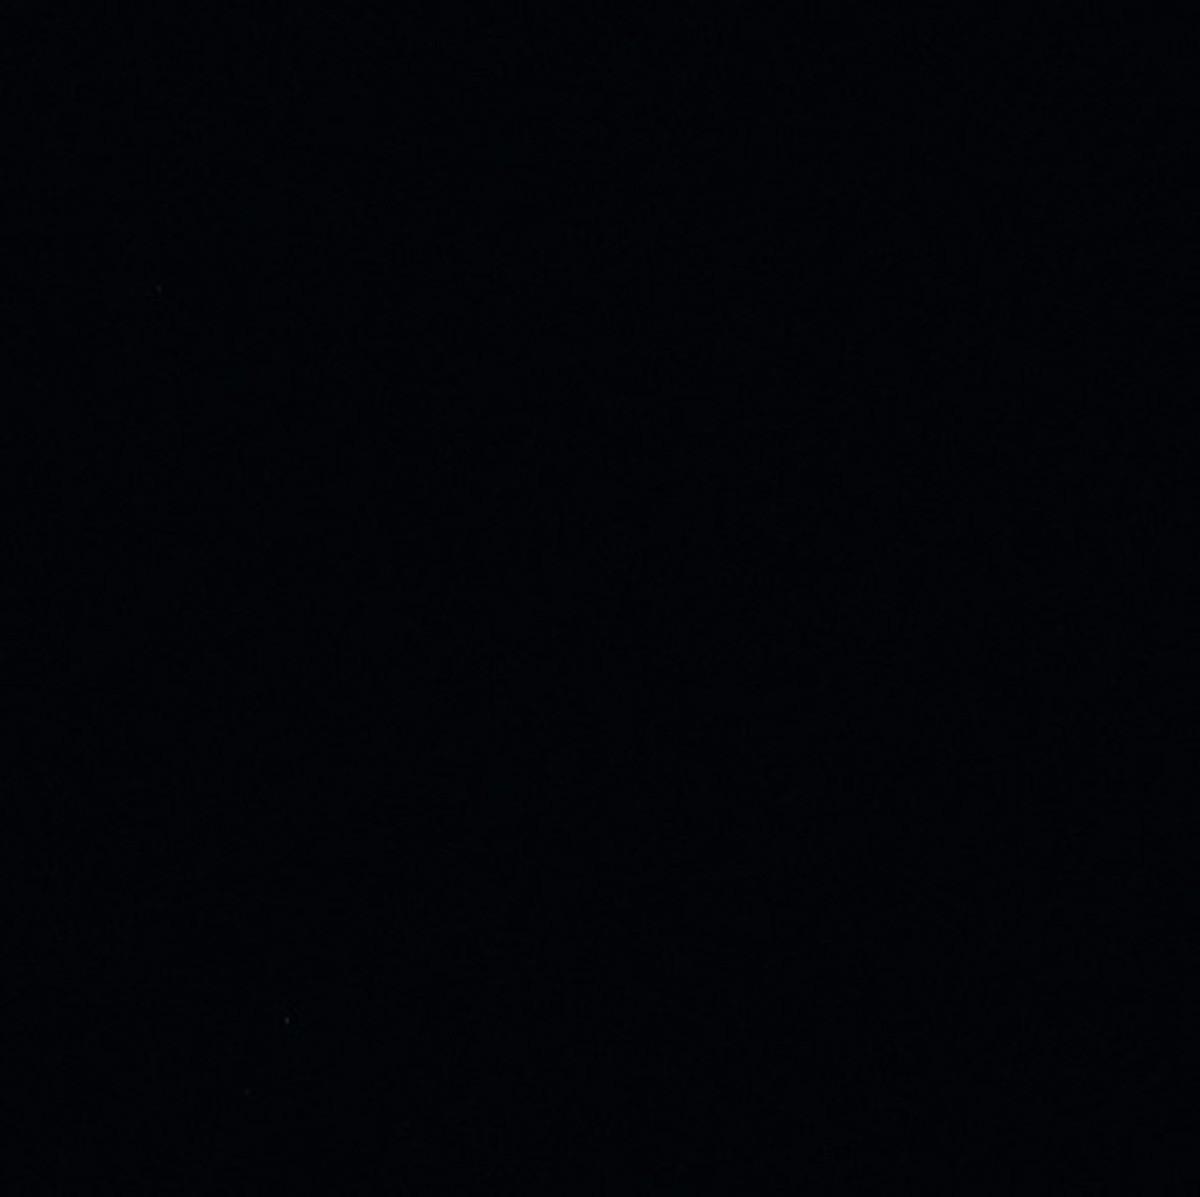 Dlažba Tonalite Diamante nero 15x15 cm mat DIA1301